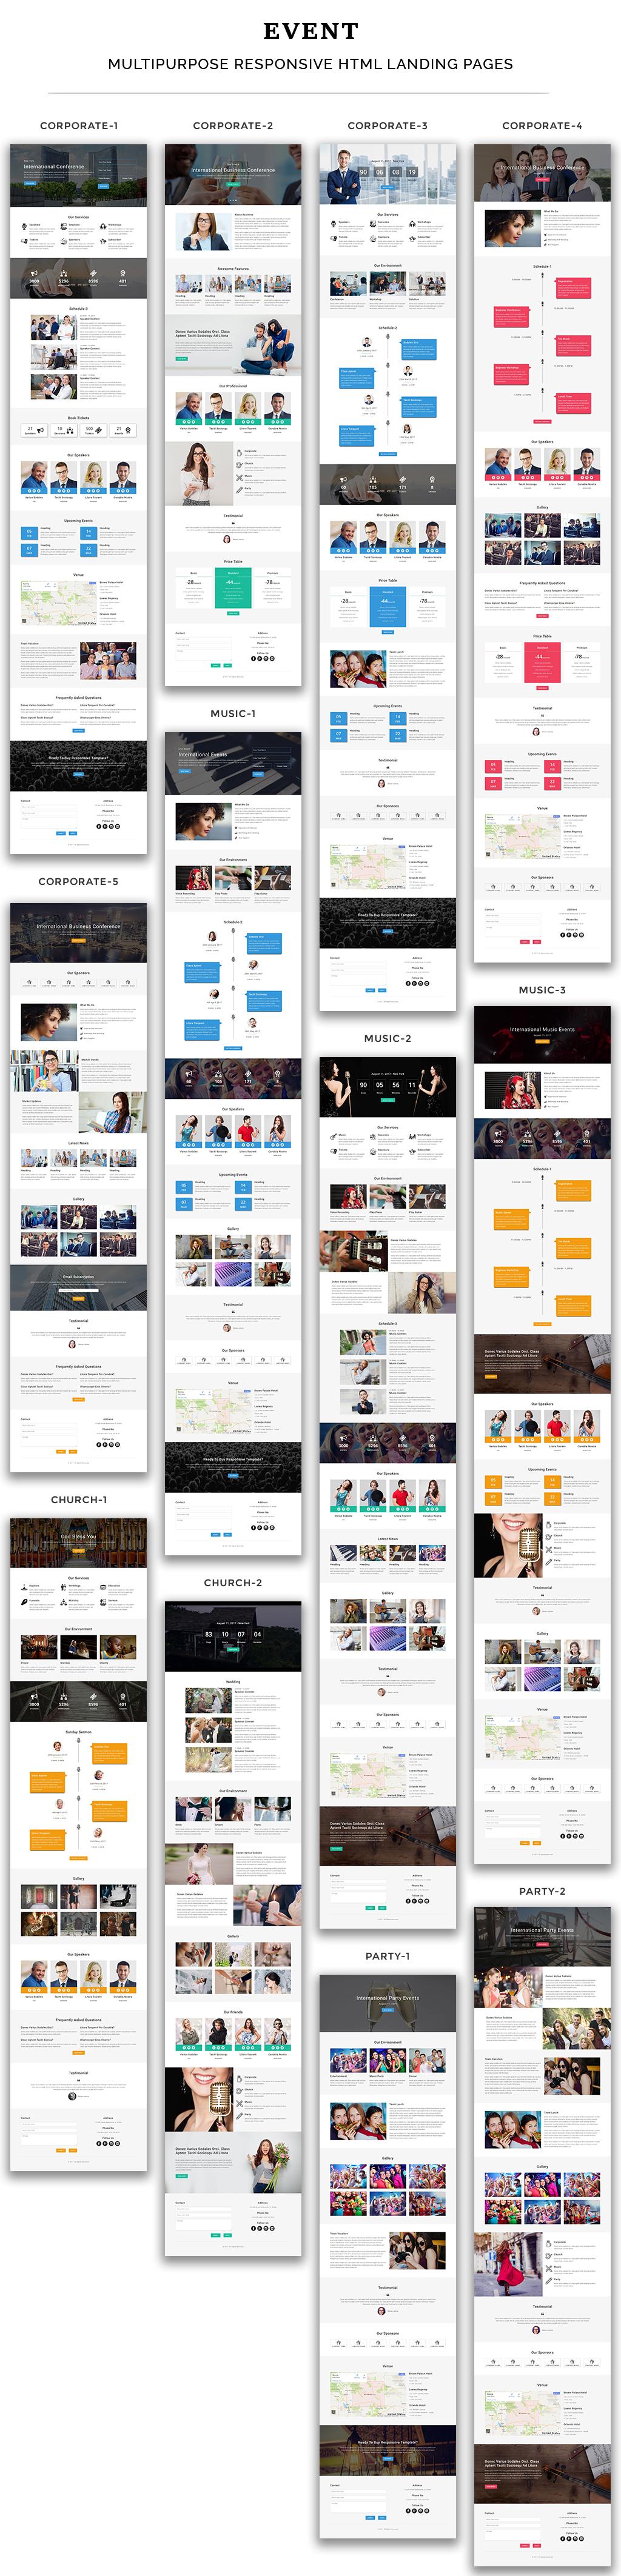 EVENT - Multipurpose Responsive HTML Landing Page